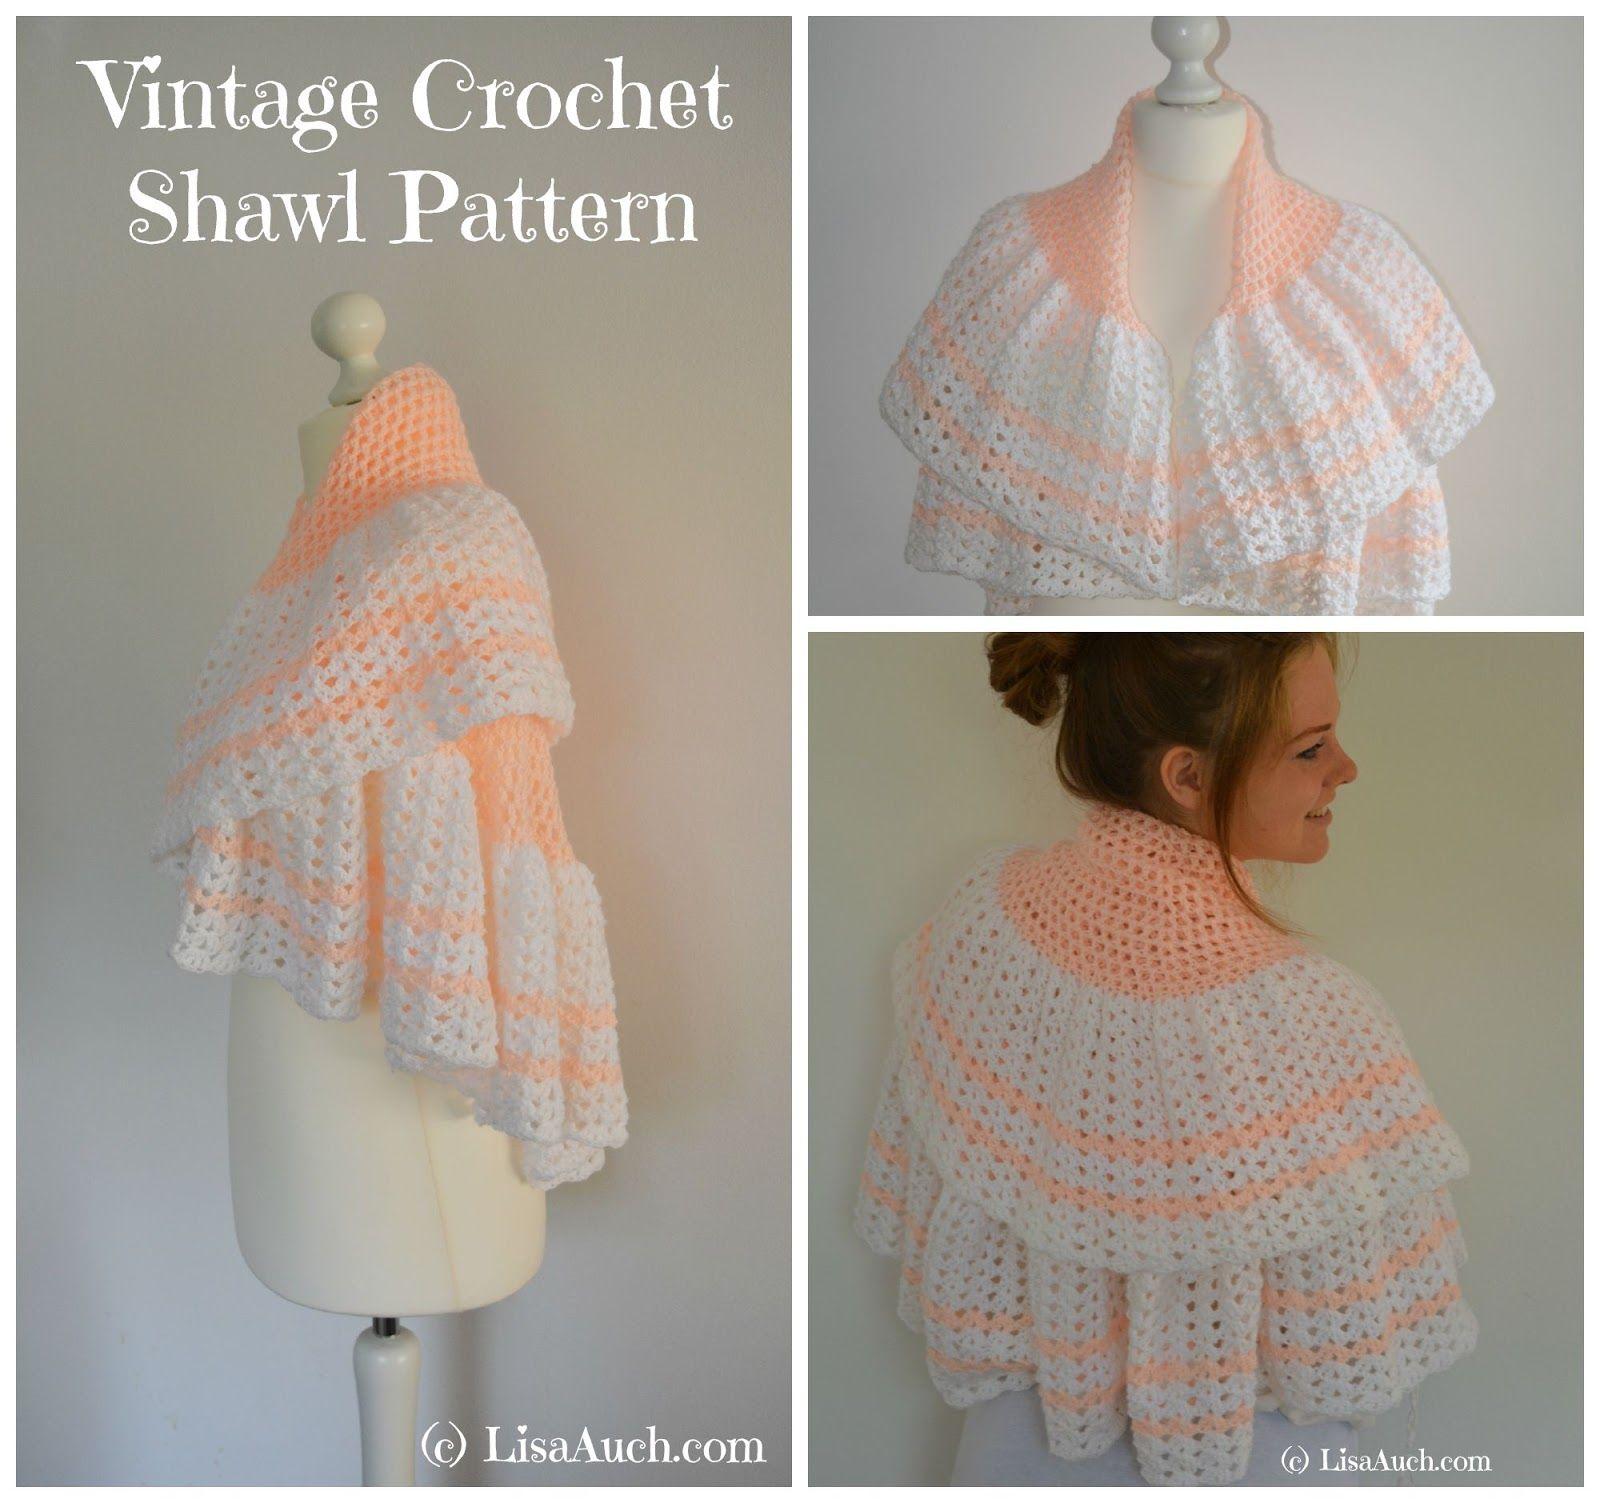 Free crochet shawl ideal baby blanket vintage pattern easy free crochet shawl ideal baby blanket vintage pattern easy bankloansurffo Images